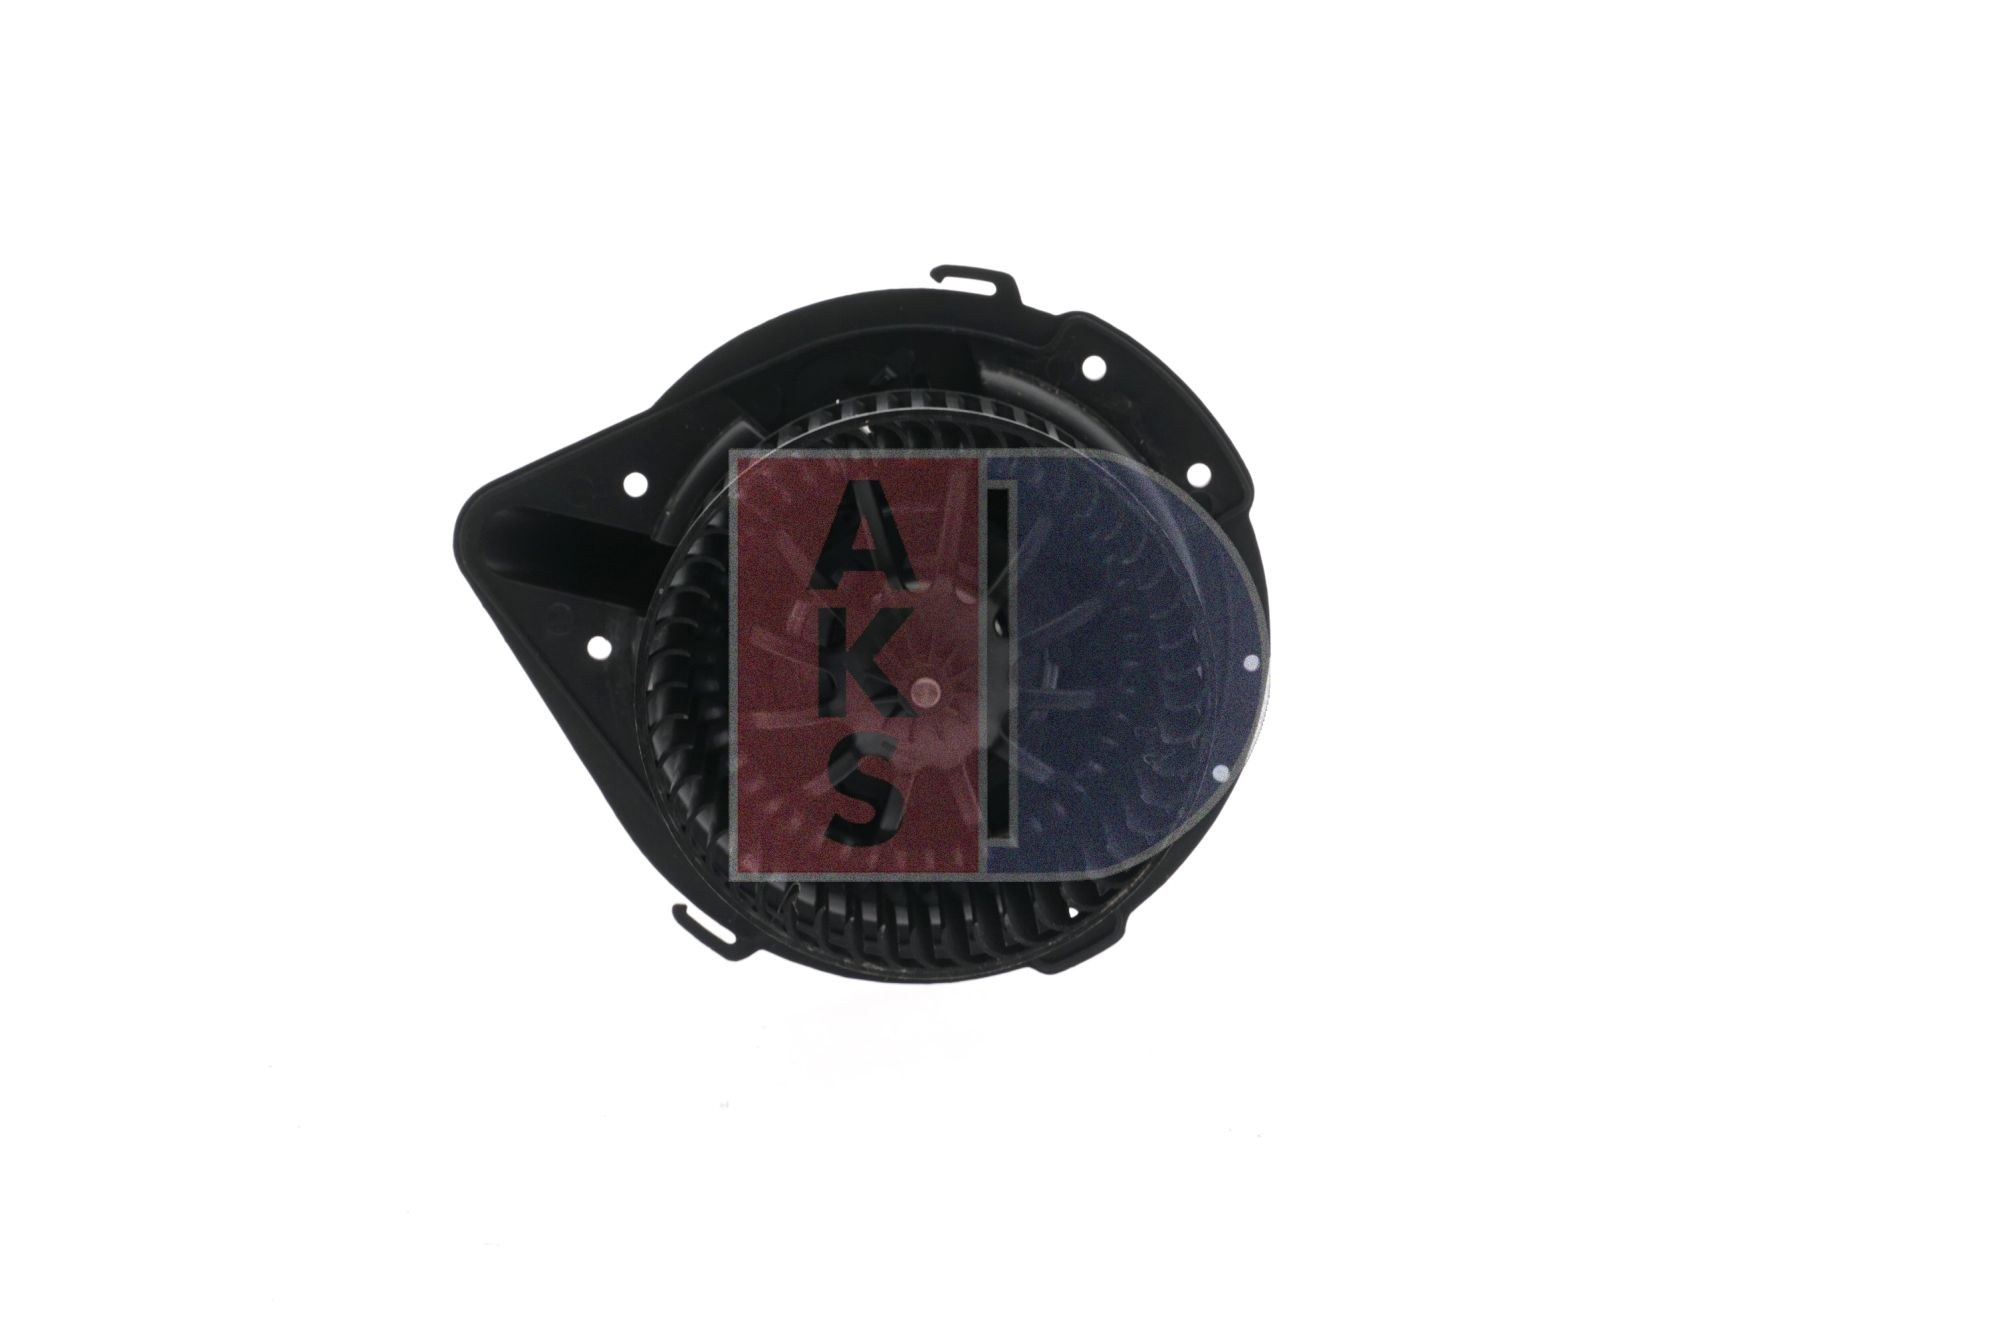 AKS DASIS Heizgebläsemotor 488070N